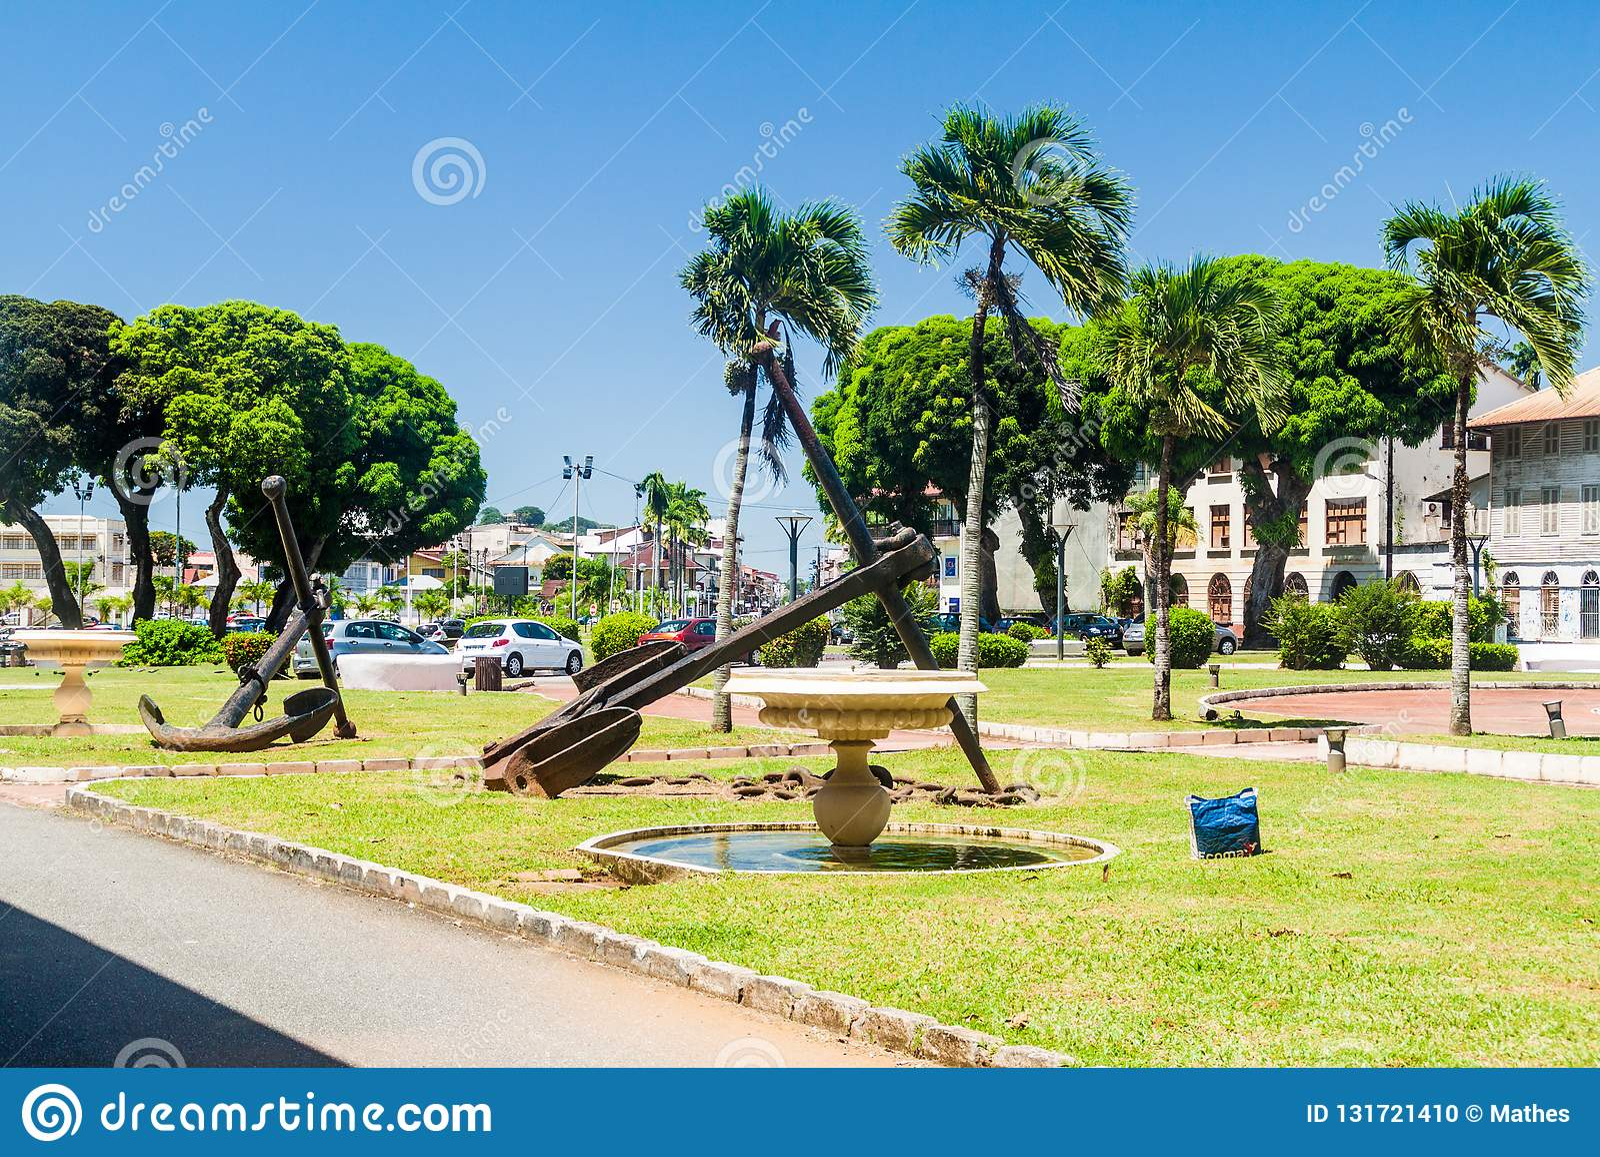 CAYENNE, ΓΑΛΛΙΚΗ ΓΟΥΙΑΝΑ - 3 ΑΥΓΟΎΣΤΟΥ 2015: Οι παλαιές άγκυρες στη θέση Leopold Heder τακτοποιούν στο Cayenne, κεφάλαιο γαλλικού